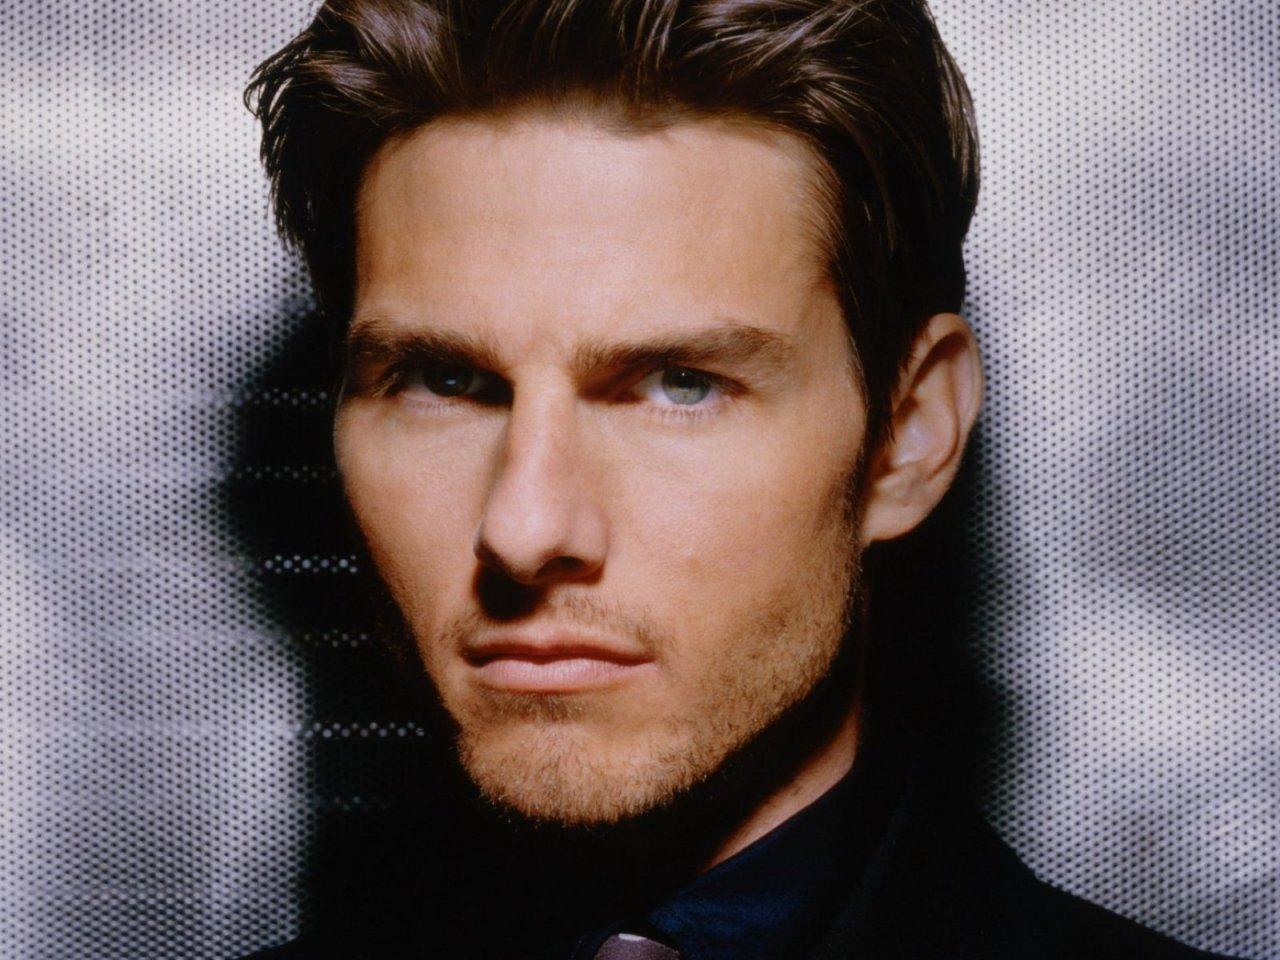 Tom Cruise Hd Wallpaper 6887110 1280x960